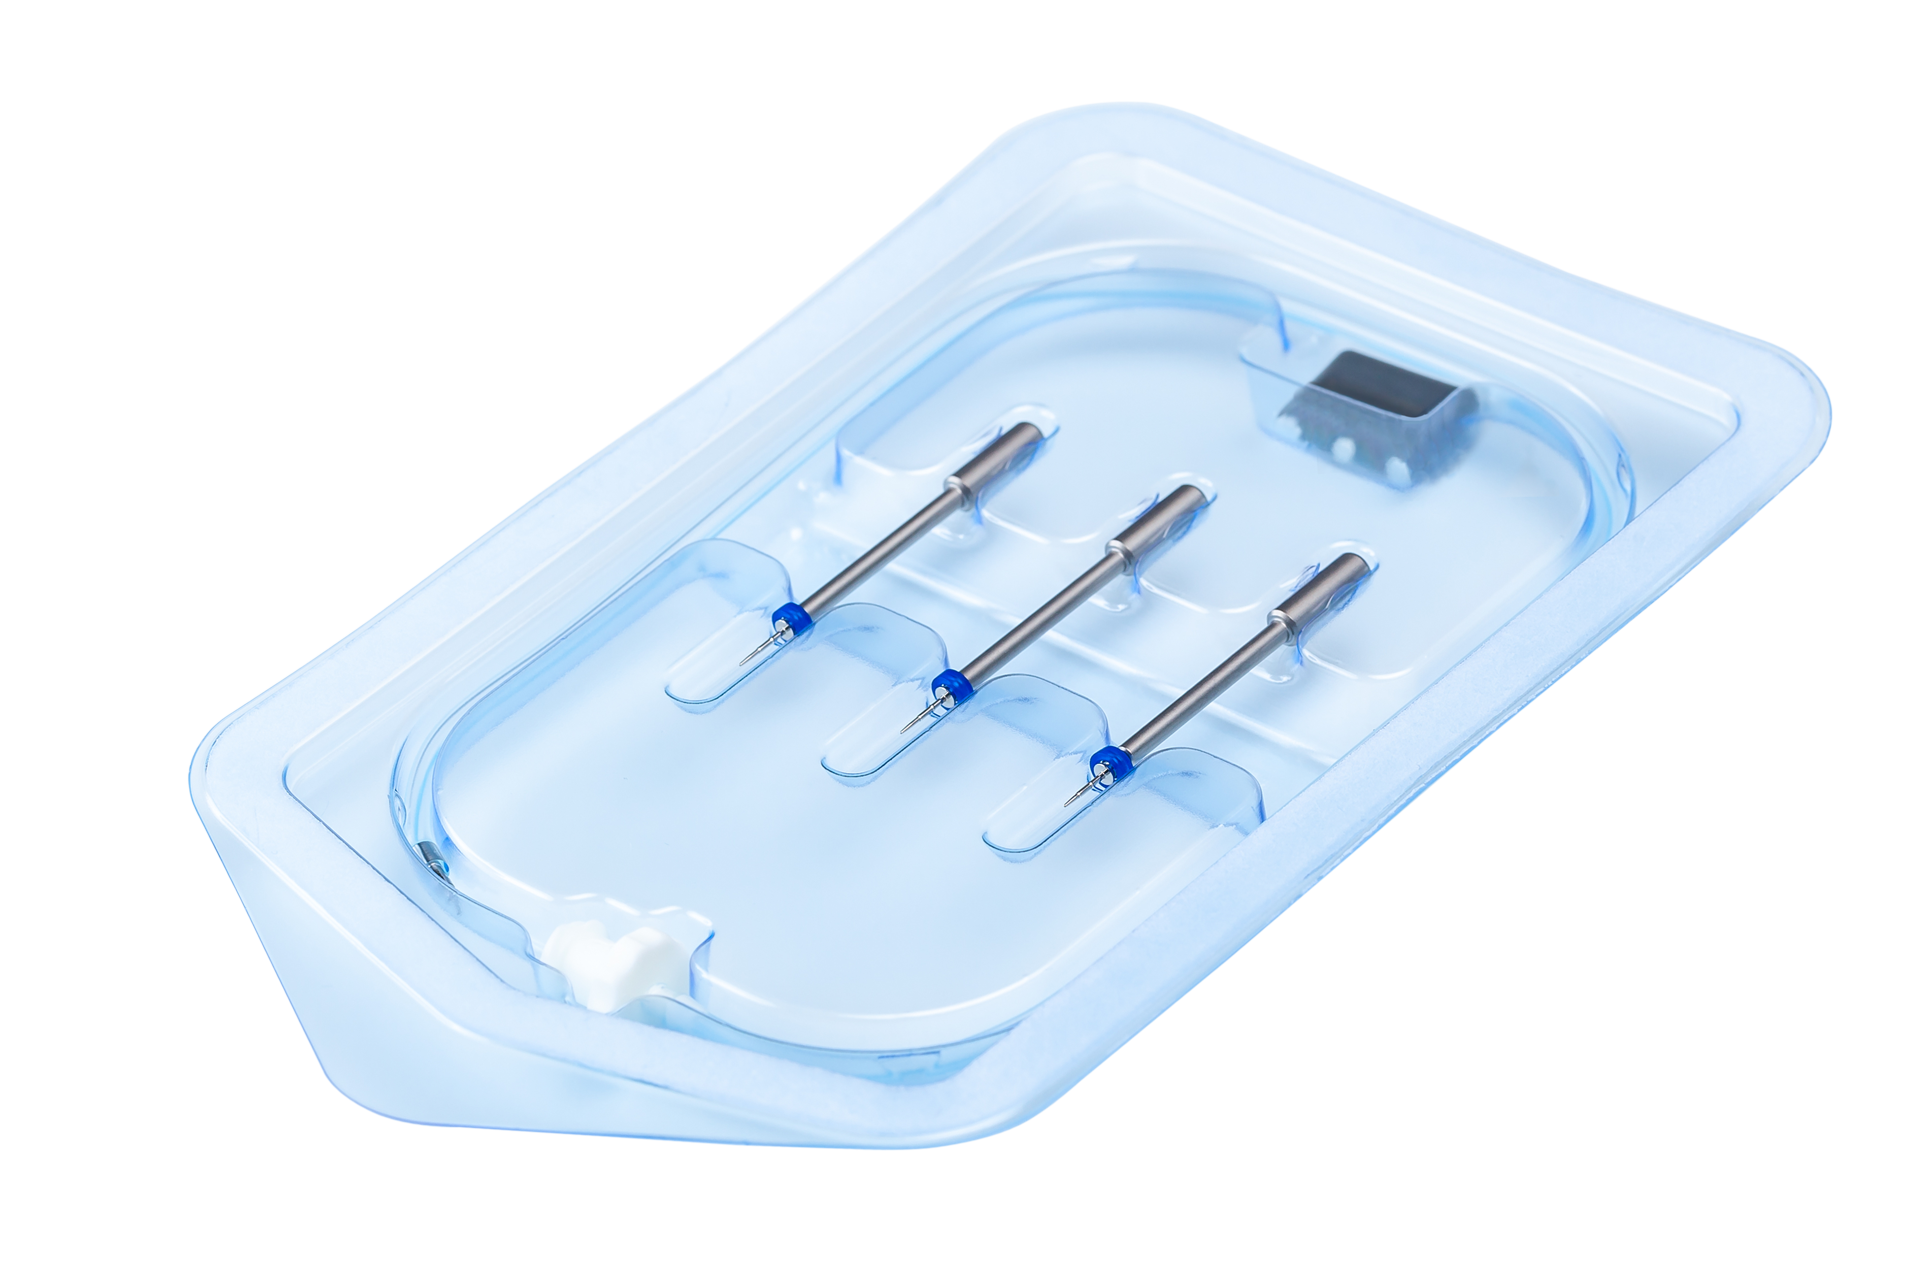 2-step vitrectomy trocar